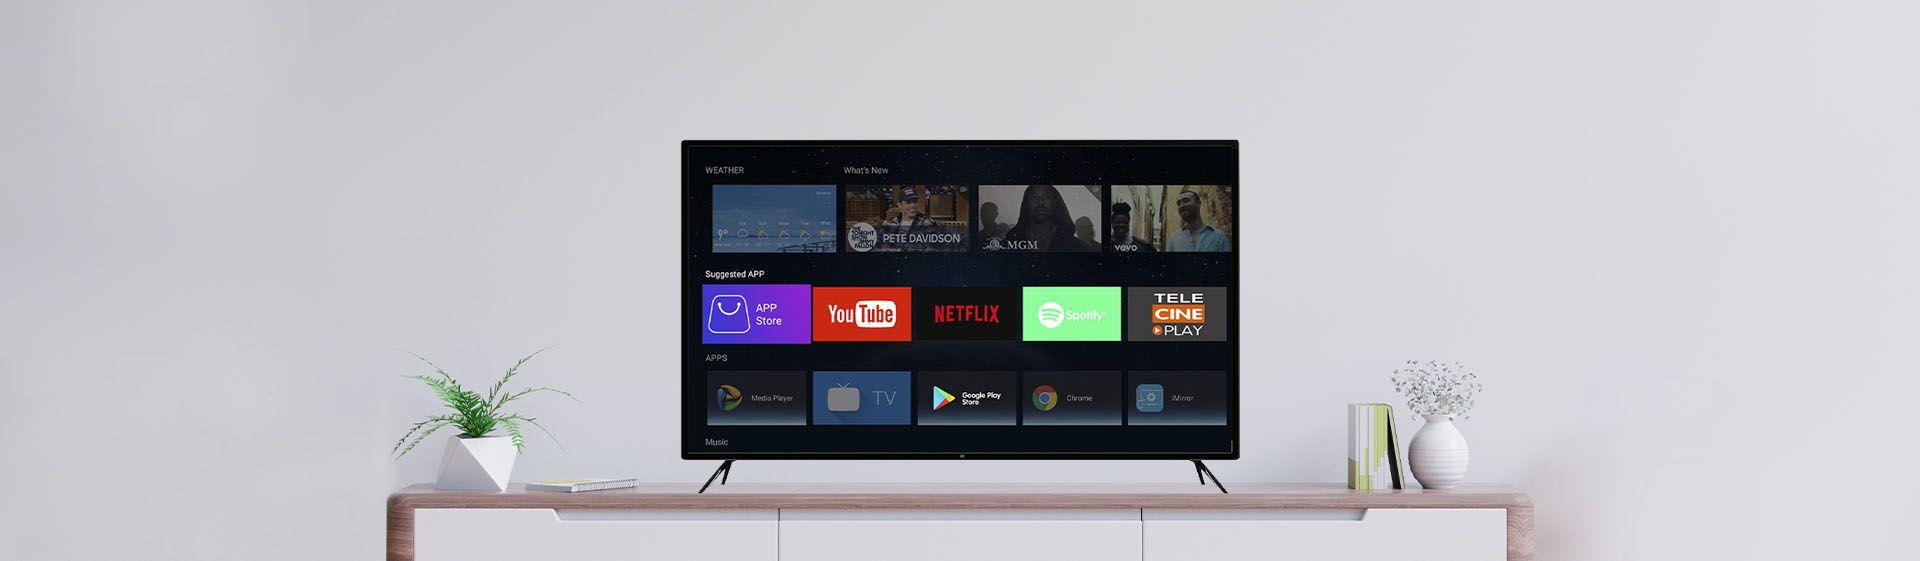 TV HQ é boa? Conheça a marca de TVs 4K e HD